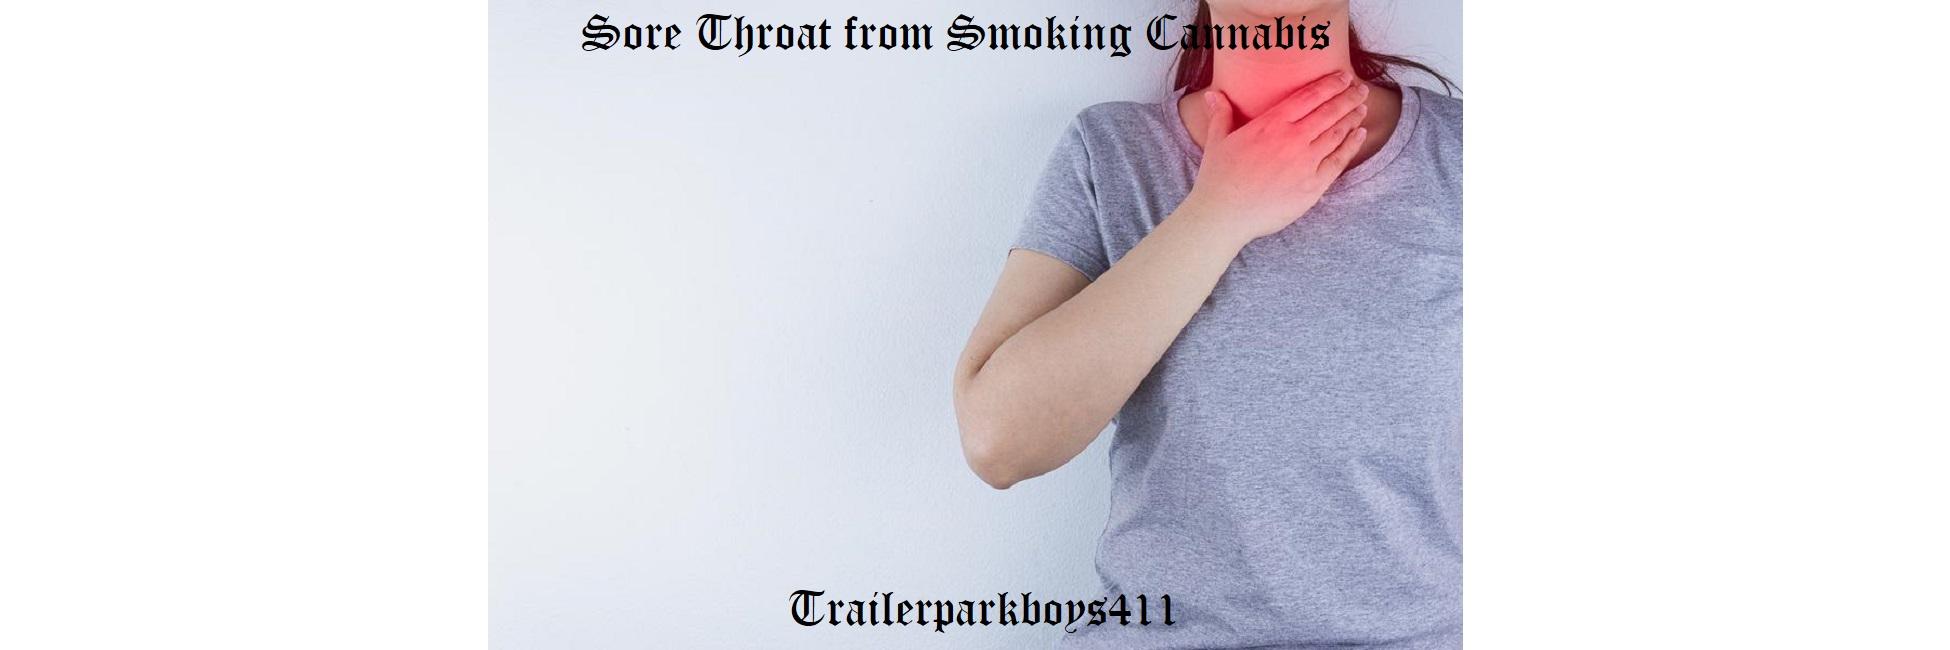 Sore Throat from Smoking Cannabis